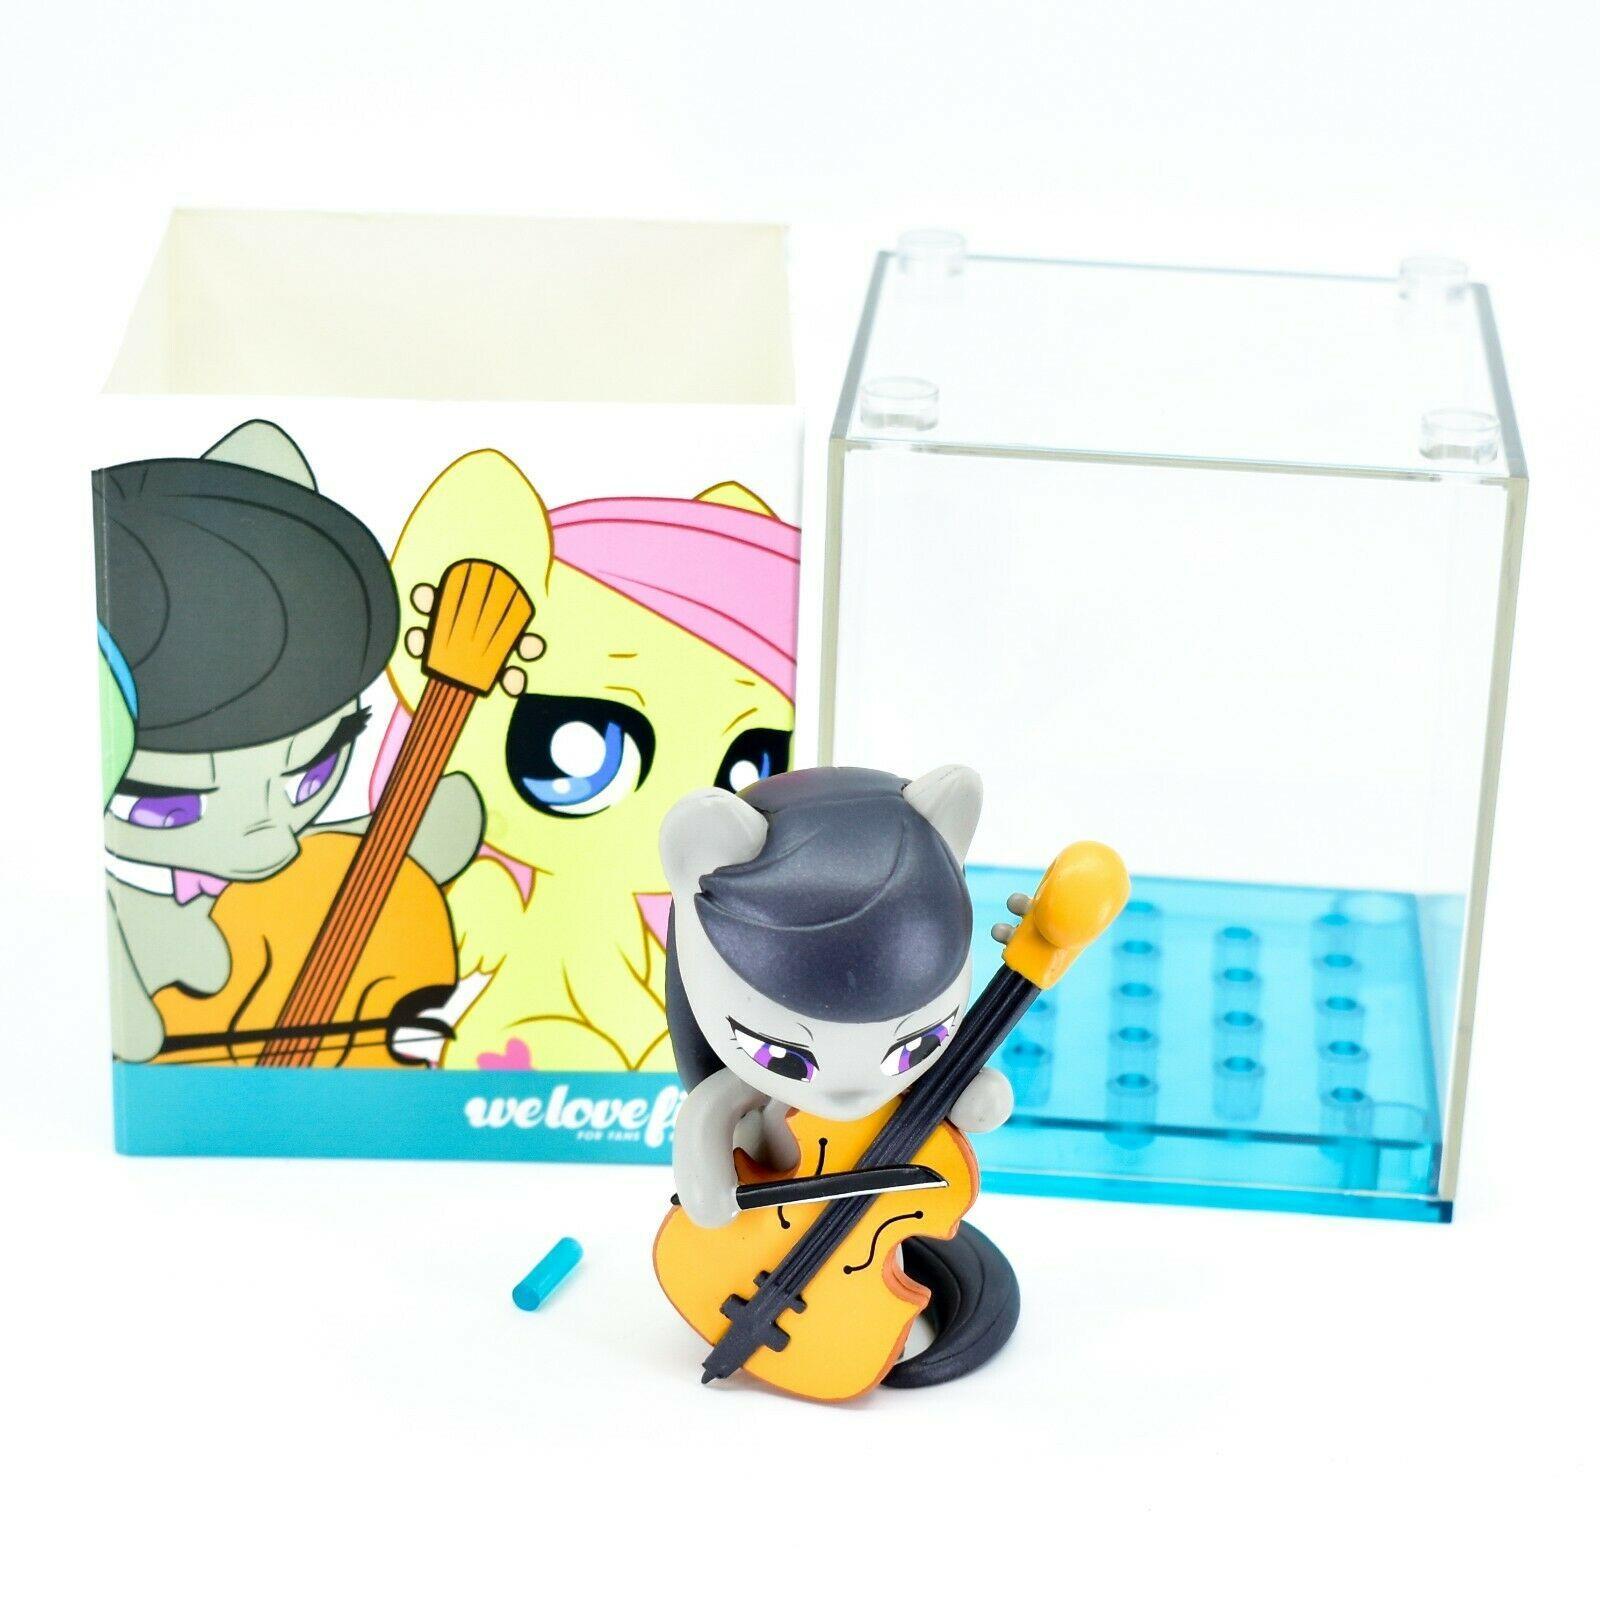 Studio Chibi My Little Pony Series 2 Octavia Melody Action Figure Statue MLP